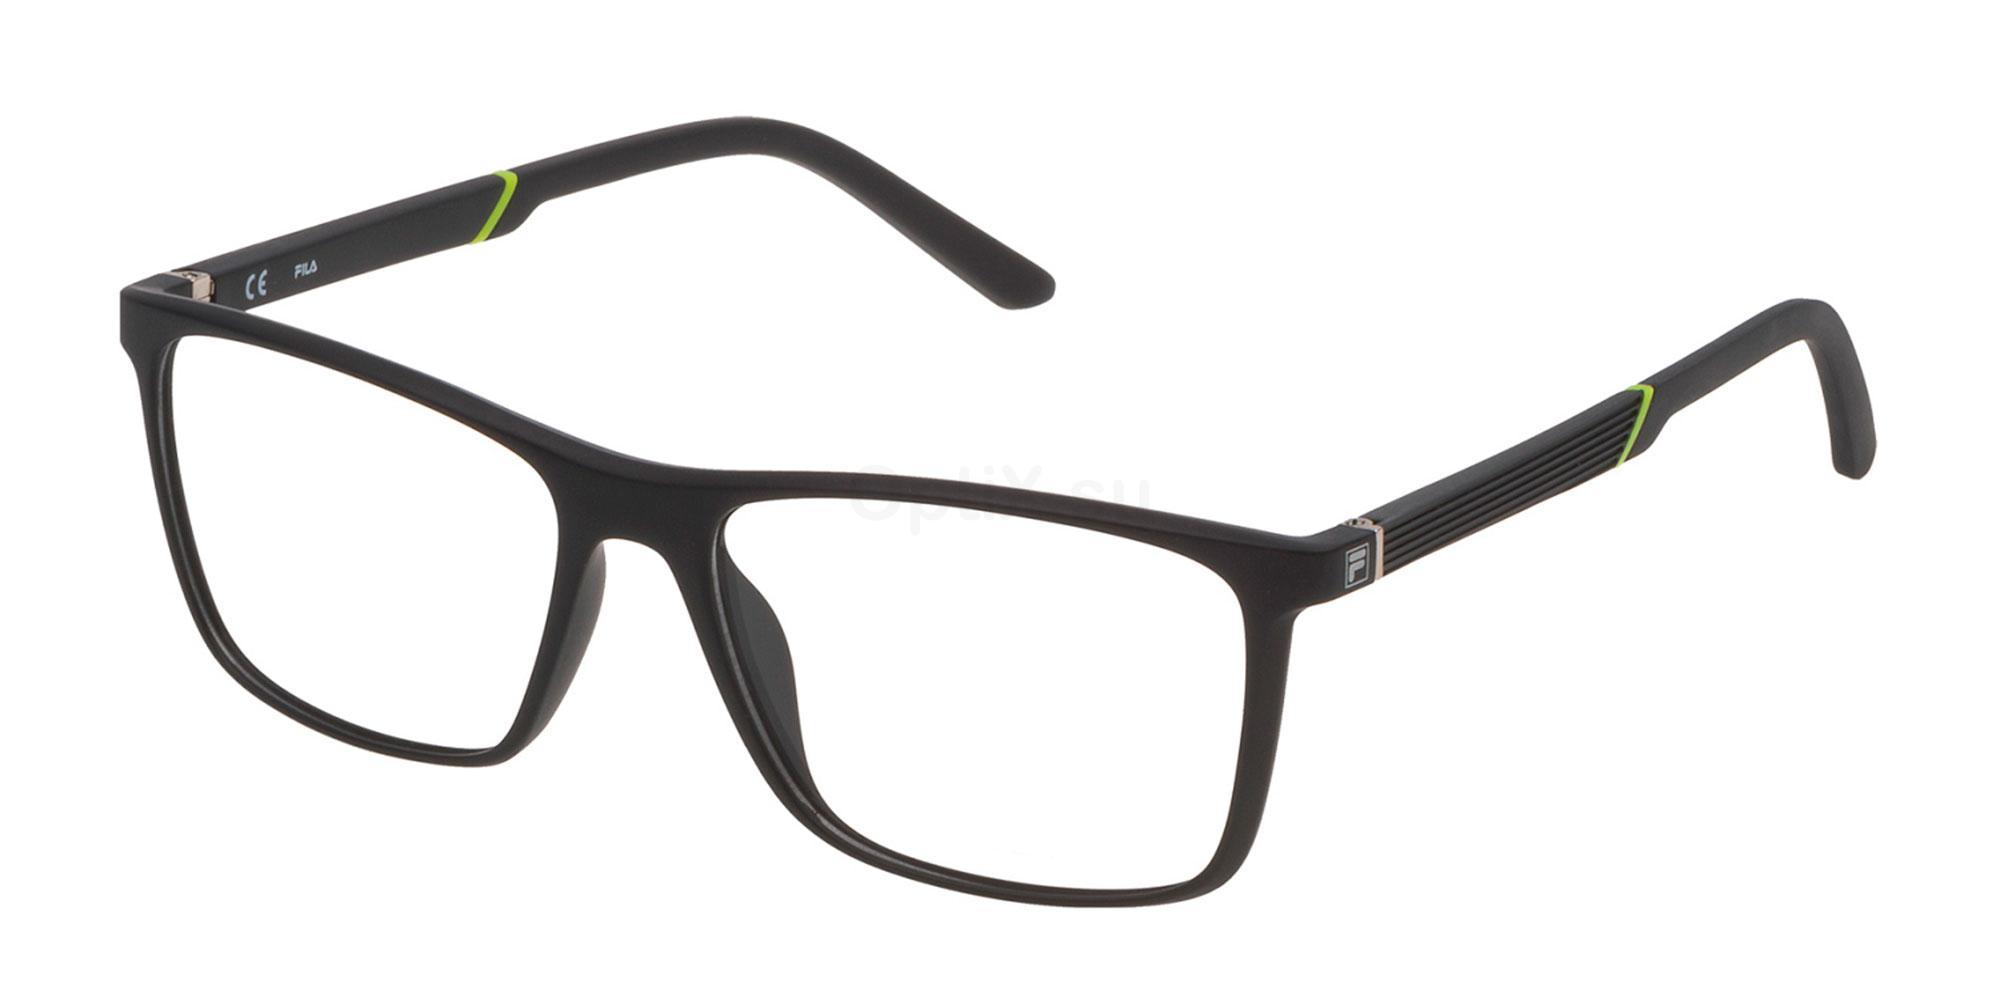 0U28 VF9173 Glasses, Fila